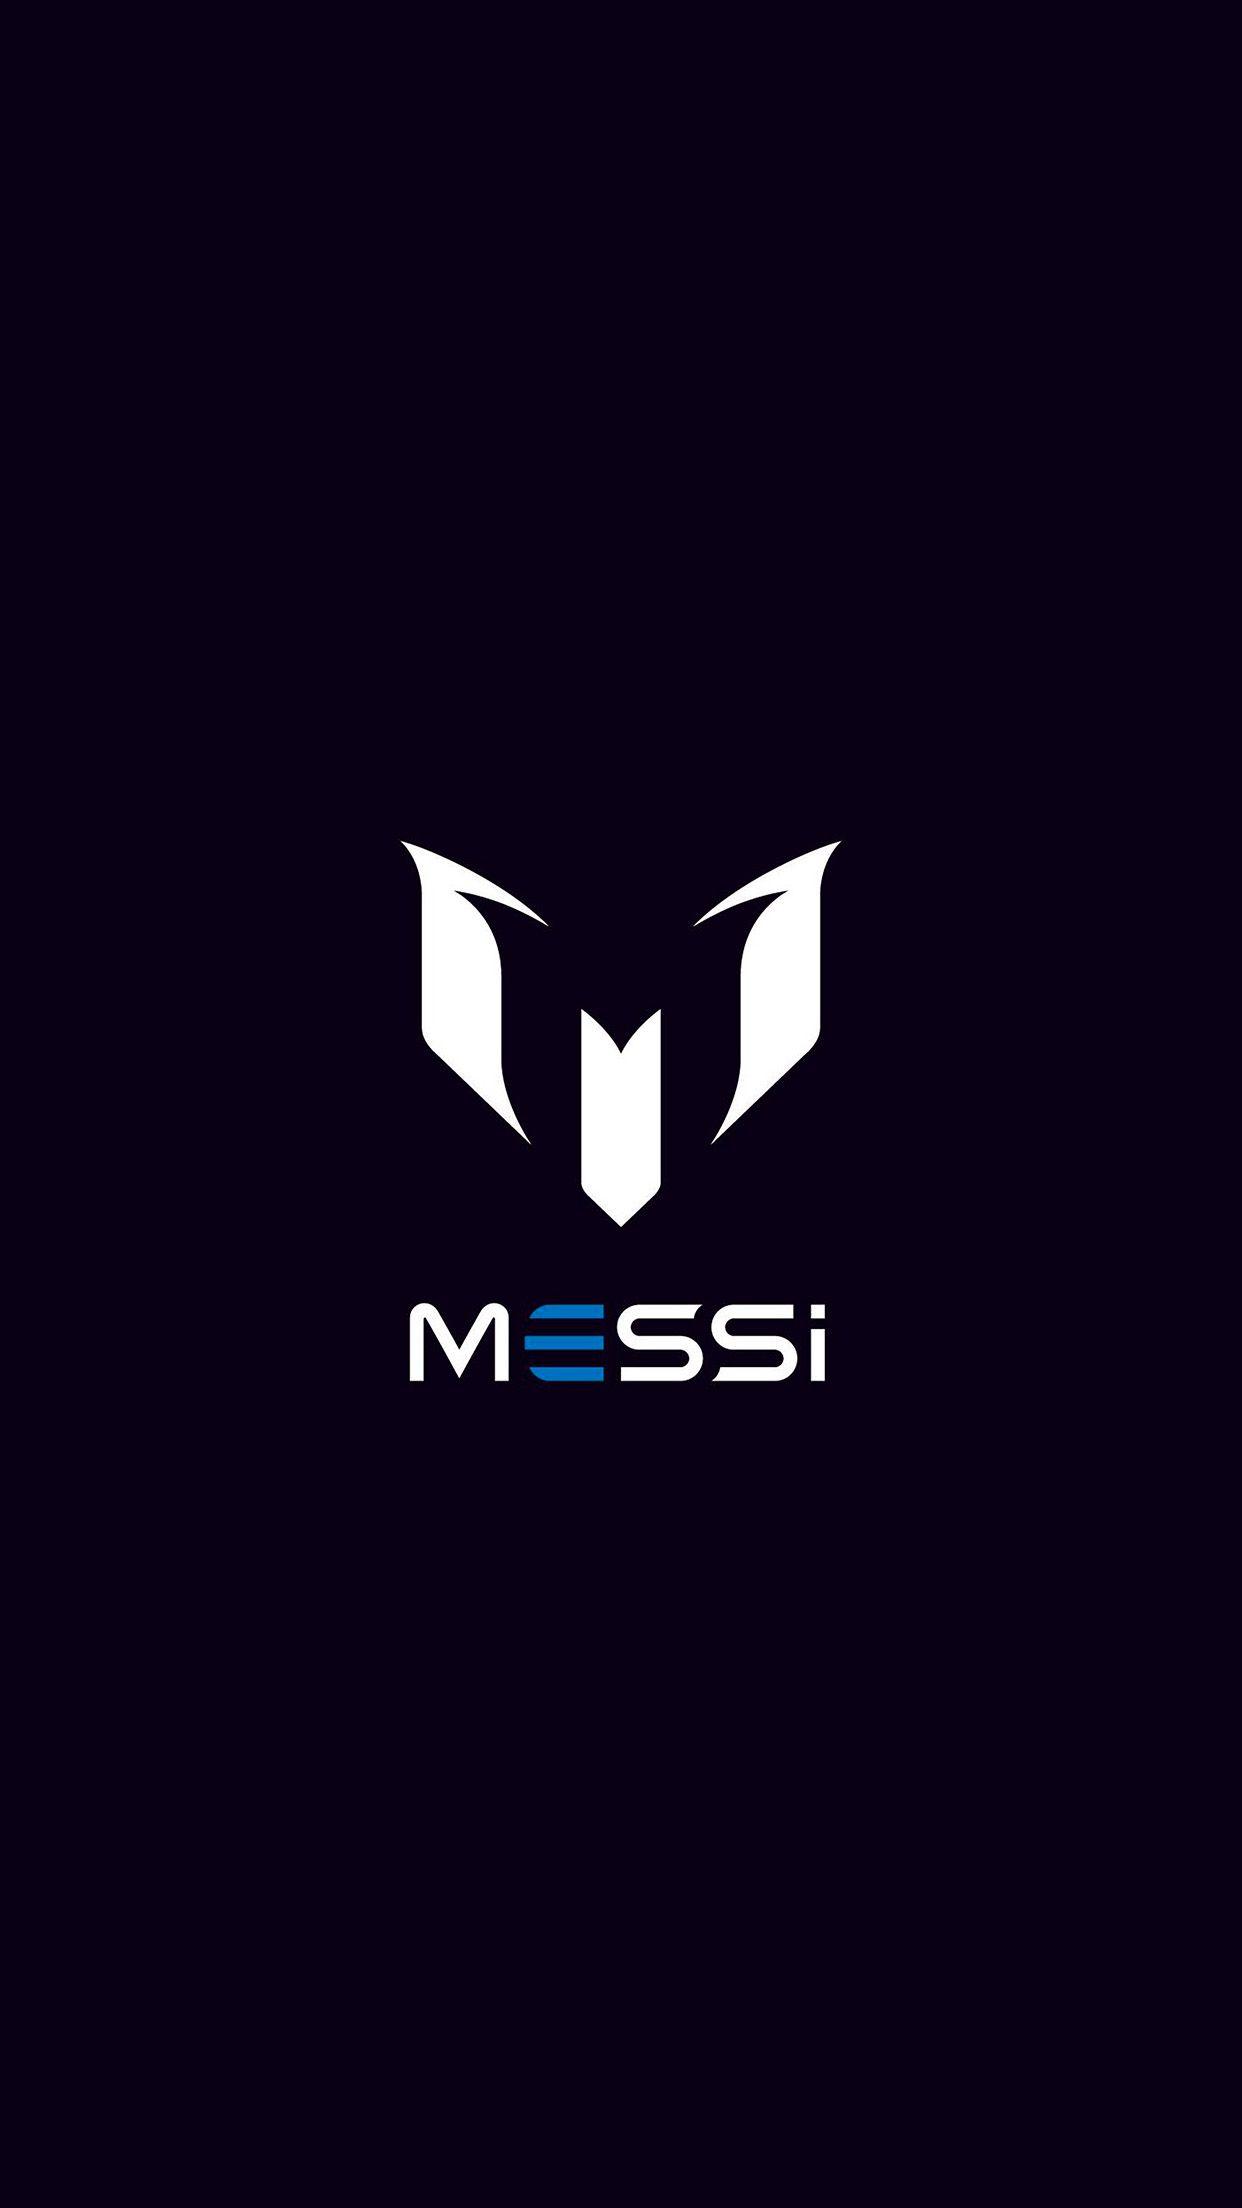 Messi Logo Art Minimal Dark Iphone6 Plus Wallpaper Jpg 1242 2208 Messi Logo Lionel Andres Messi Messi